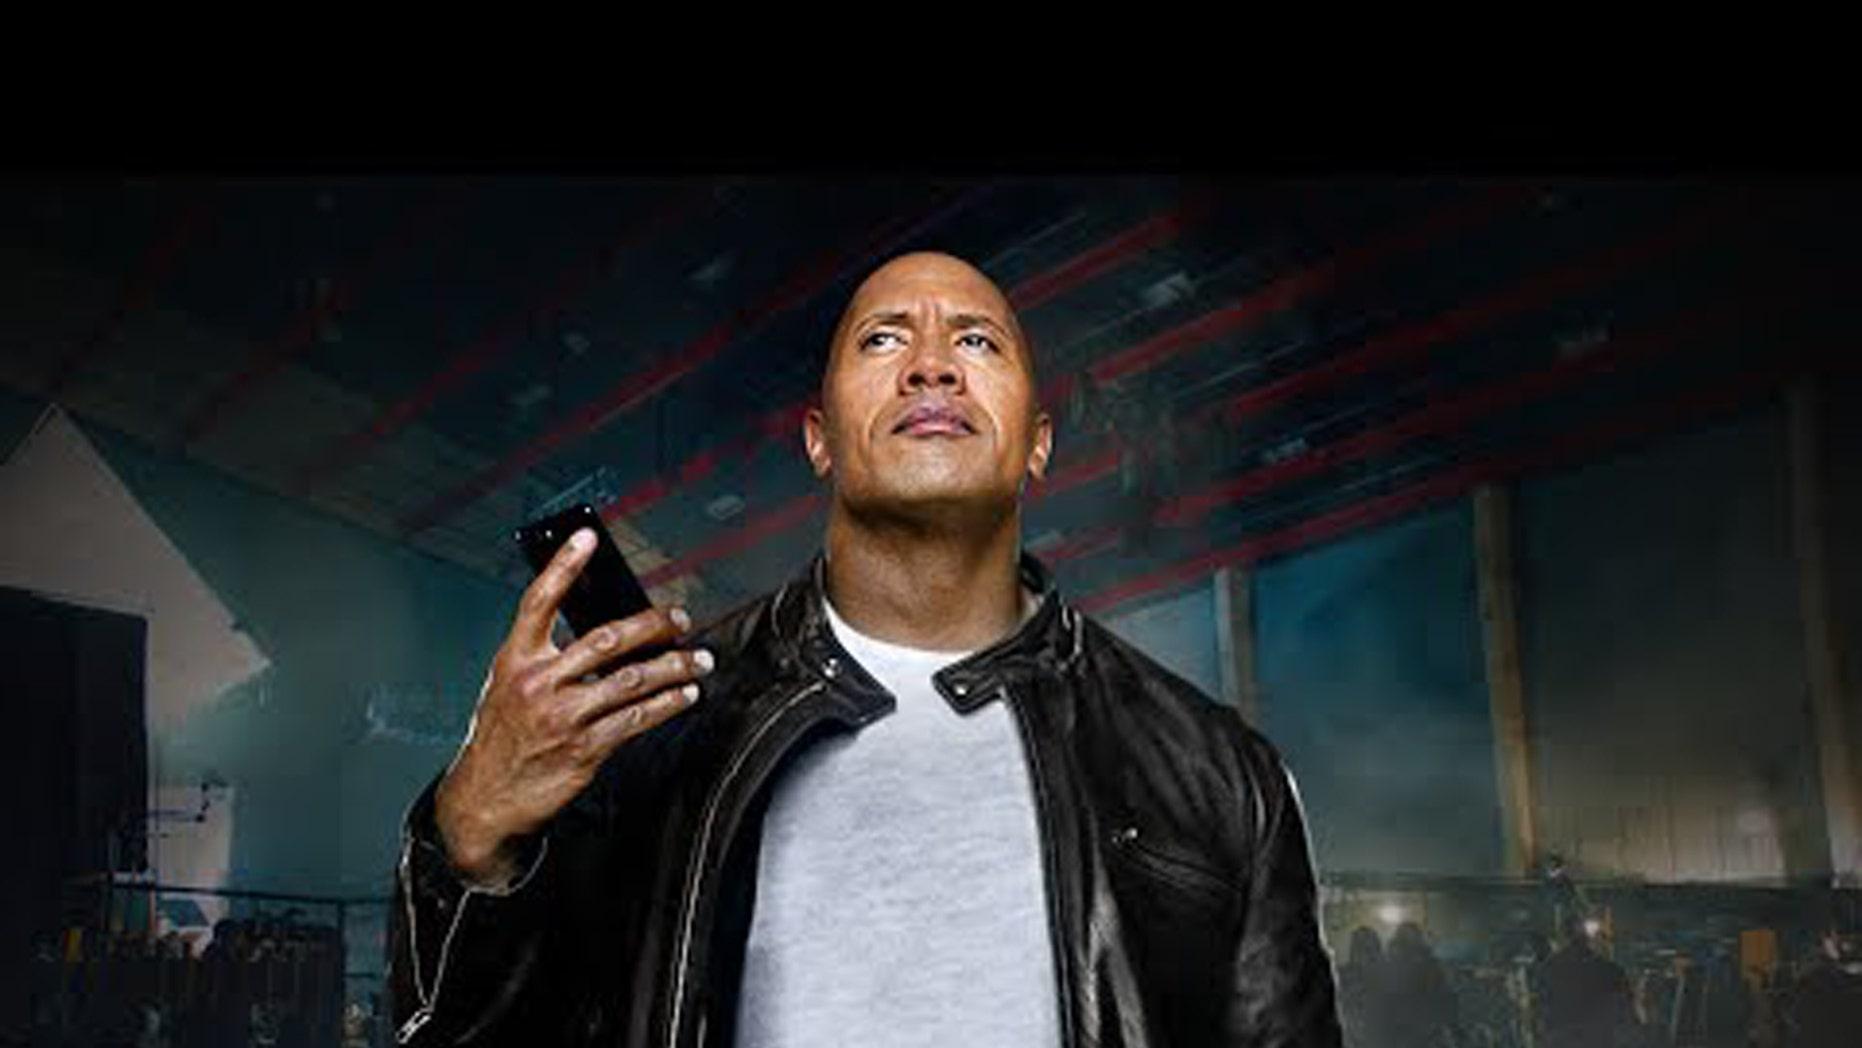 Dwayne Johnson holding an iPhone 7. (Credit: Apple, YouTube)